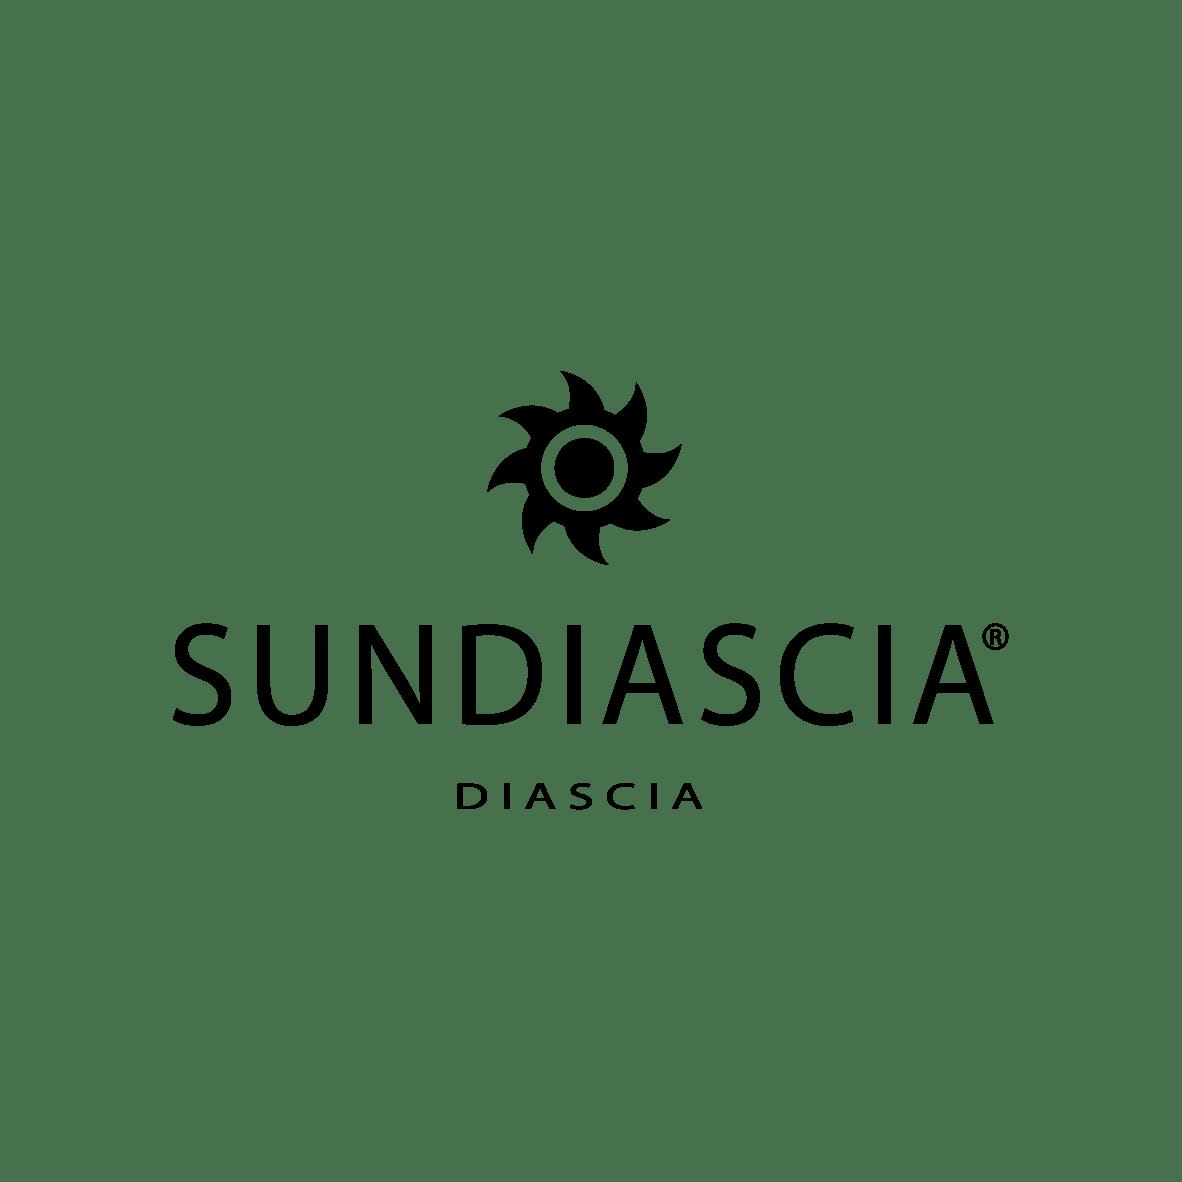 Sundiascia logo black